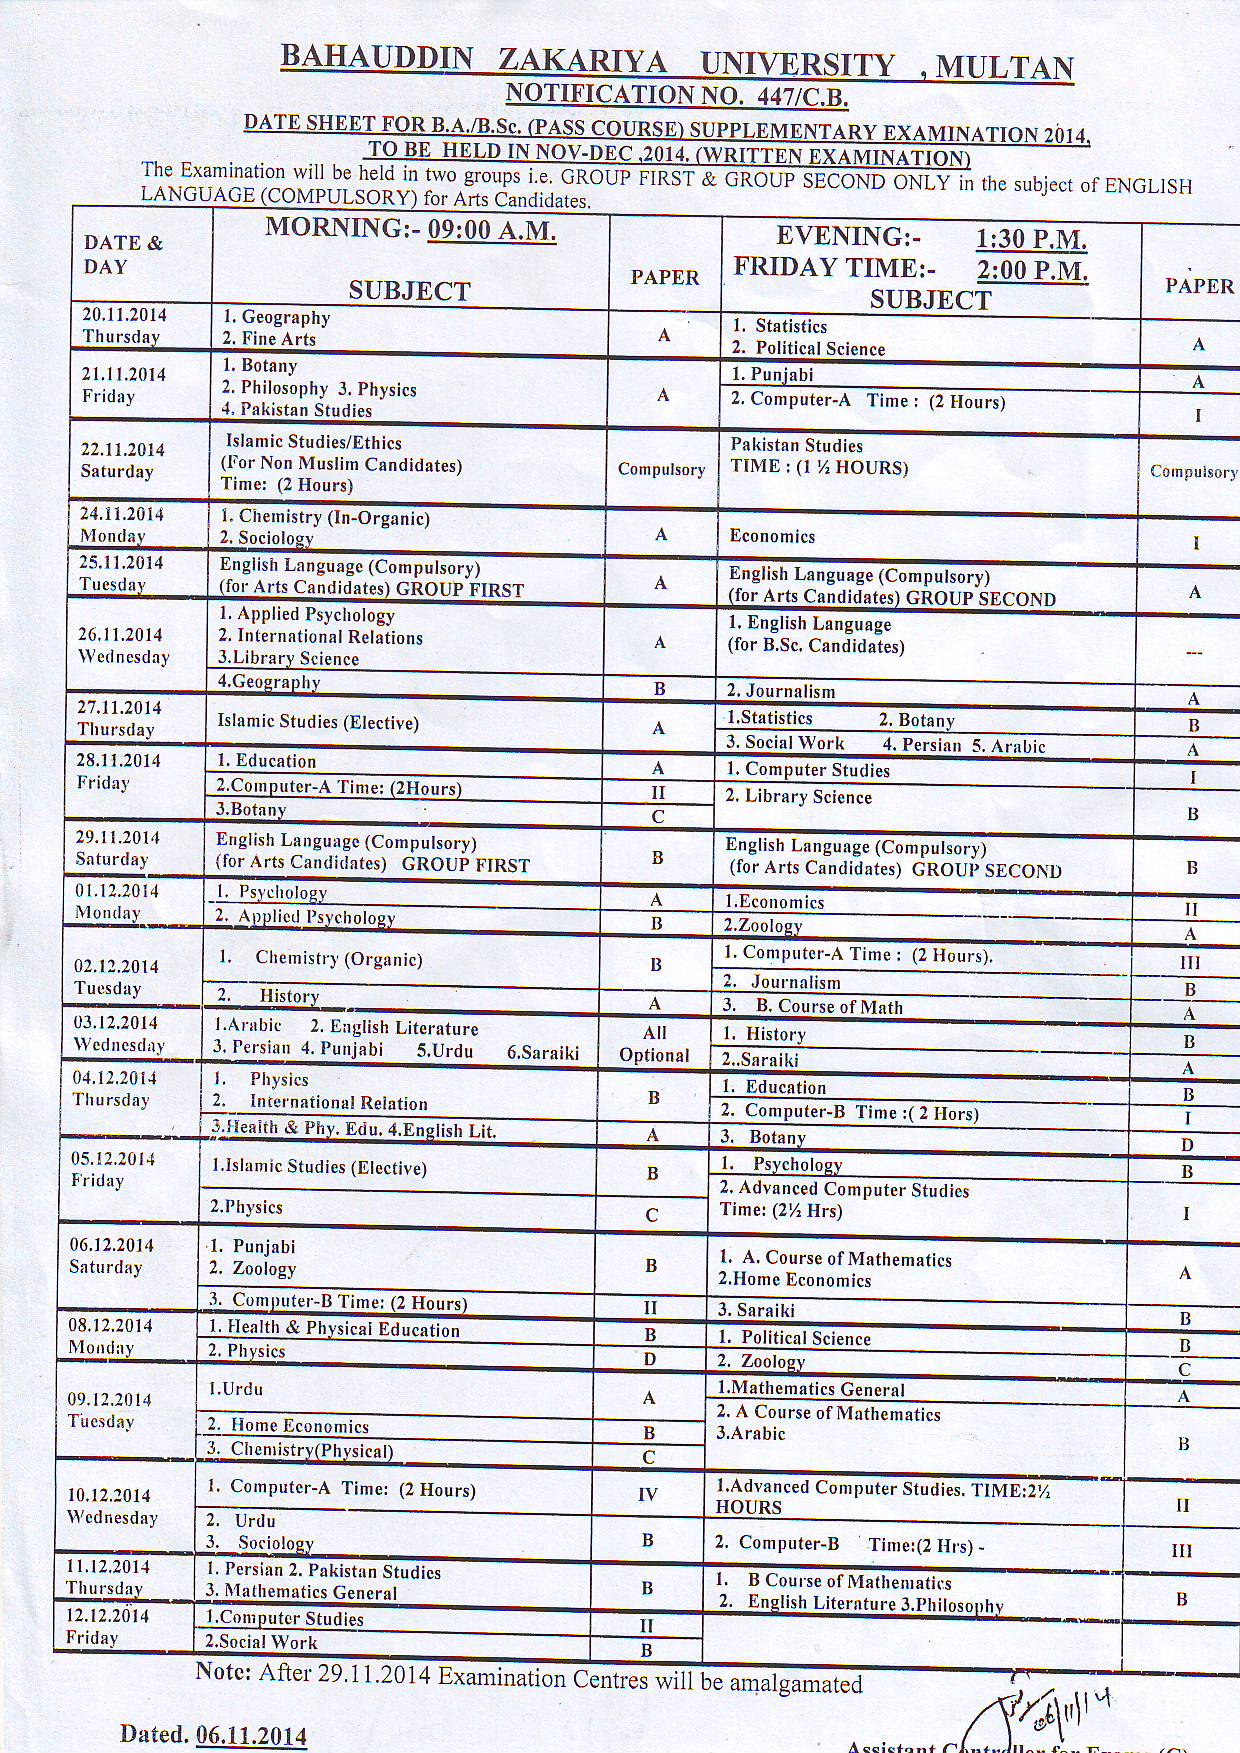 Bahauddin Zakariya University BZU BA/BSc Supplementary Date Sheet 2014